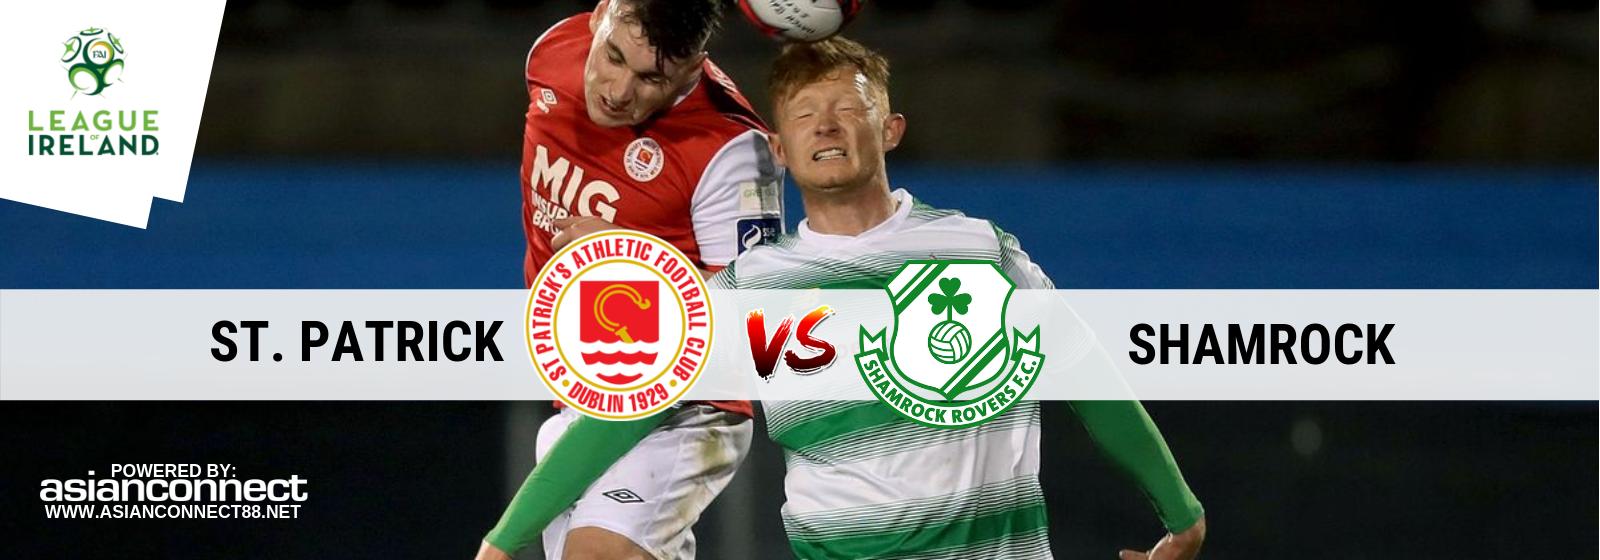 Irish Premiere League St Patrick Vs. Shamrock Asian Connect